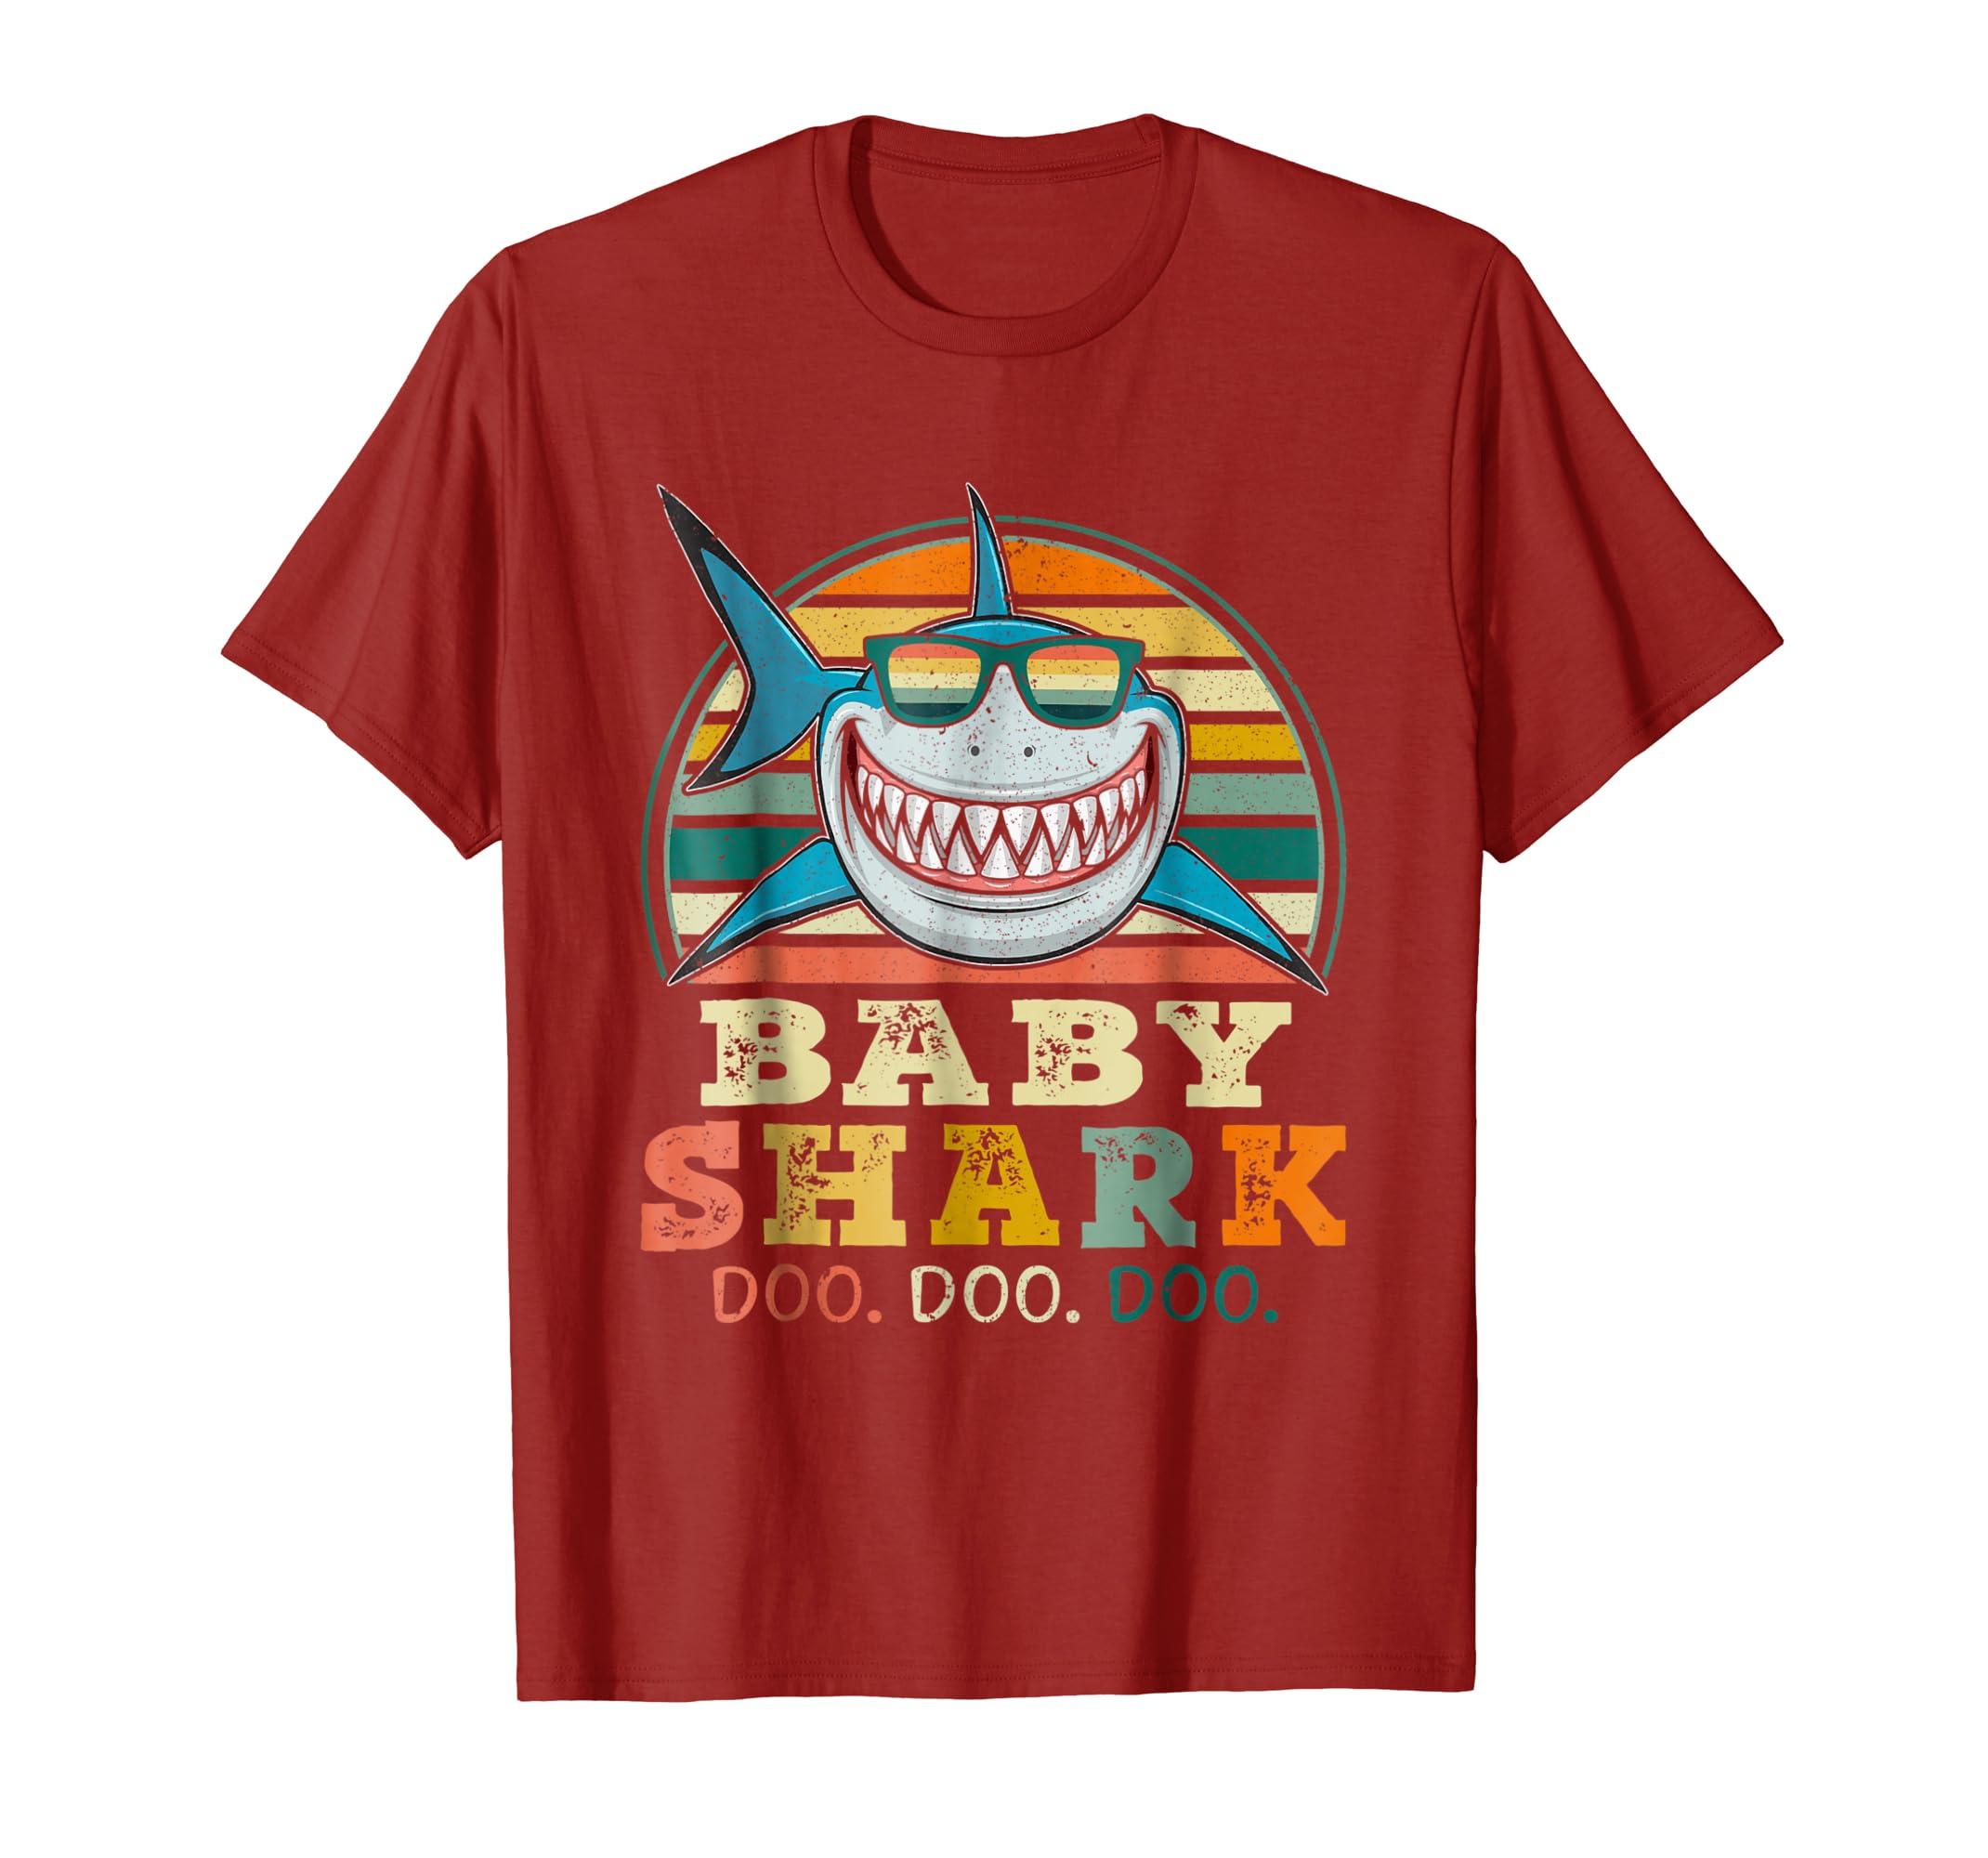 0a7d955b Retro Vintage Baby Shark TShirt Halloween Costume Gift-Teechatpro ...